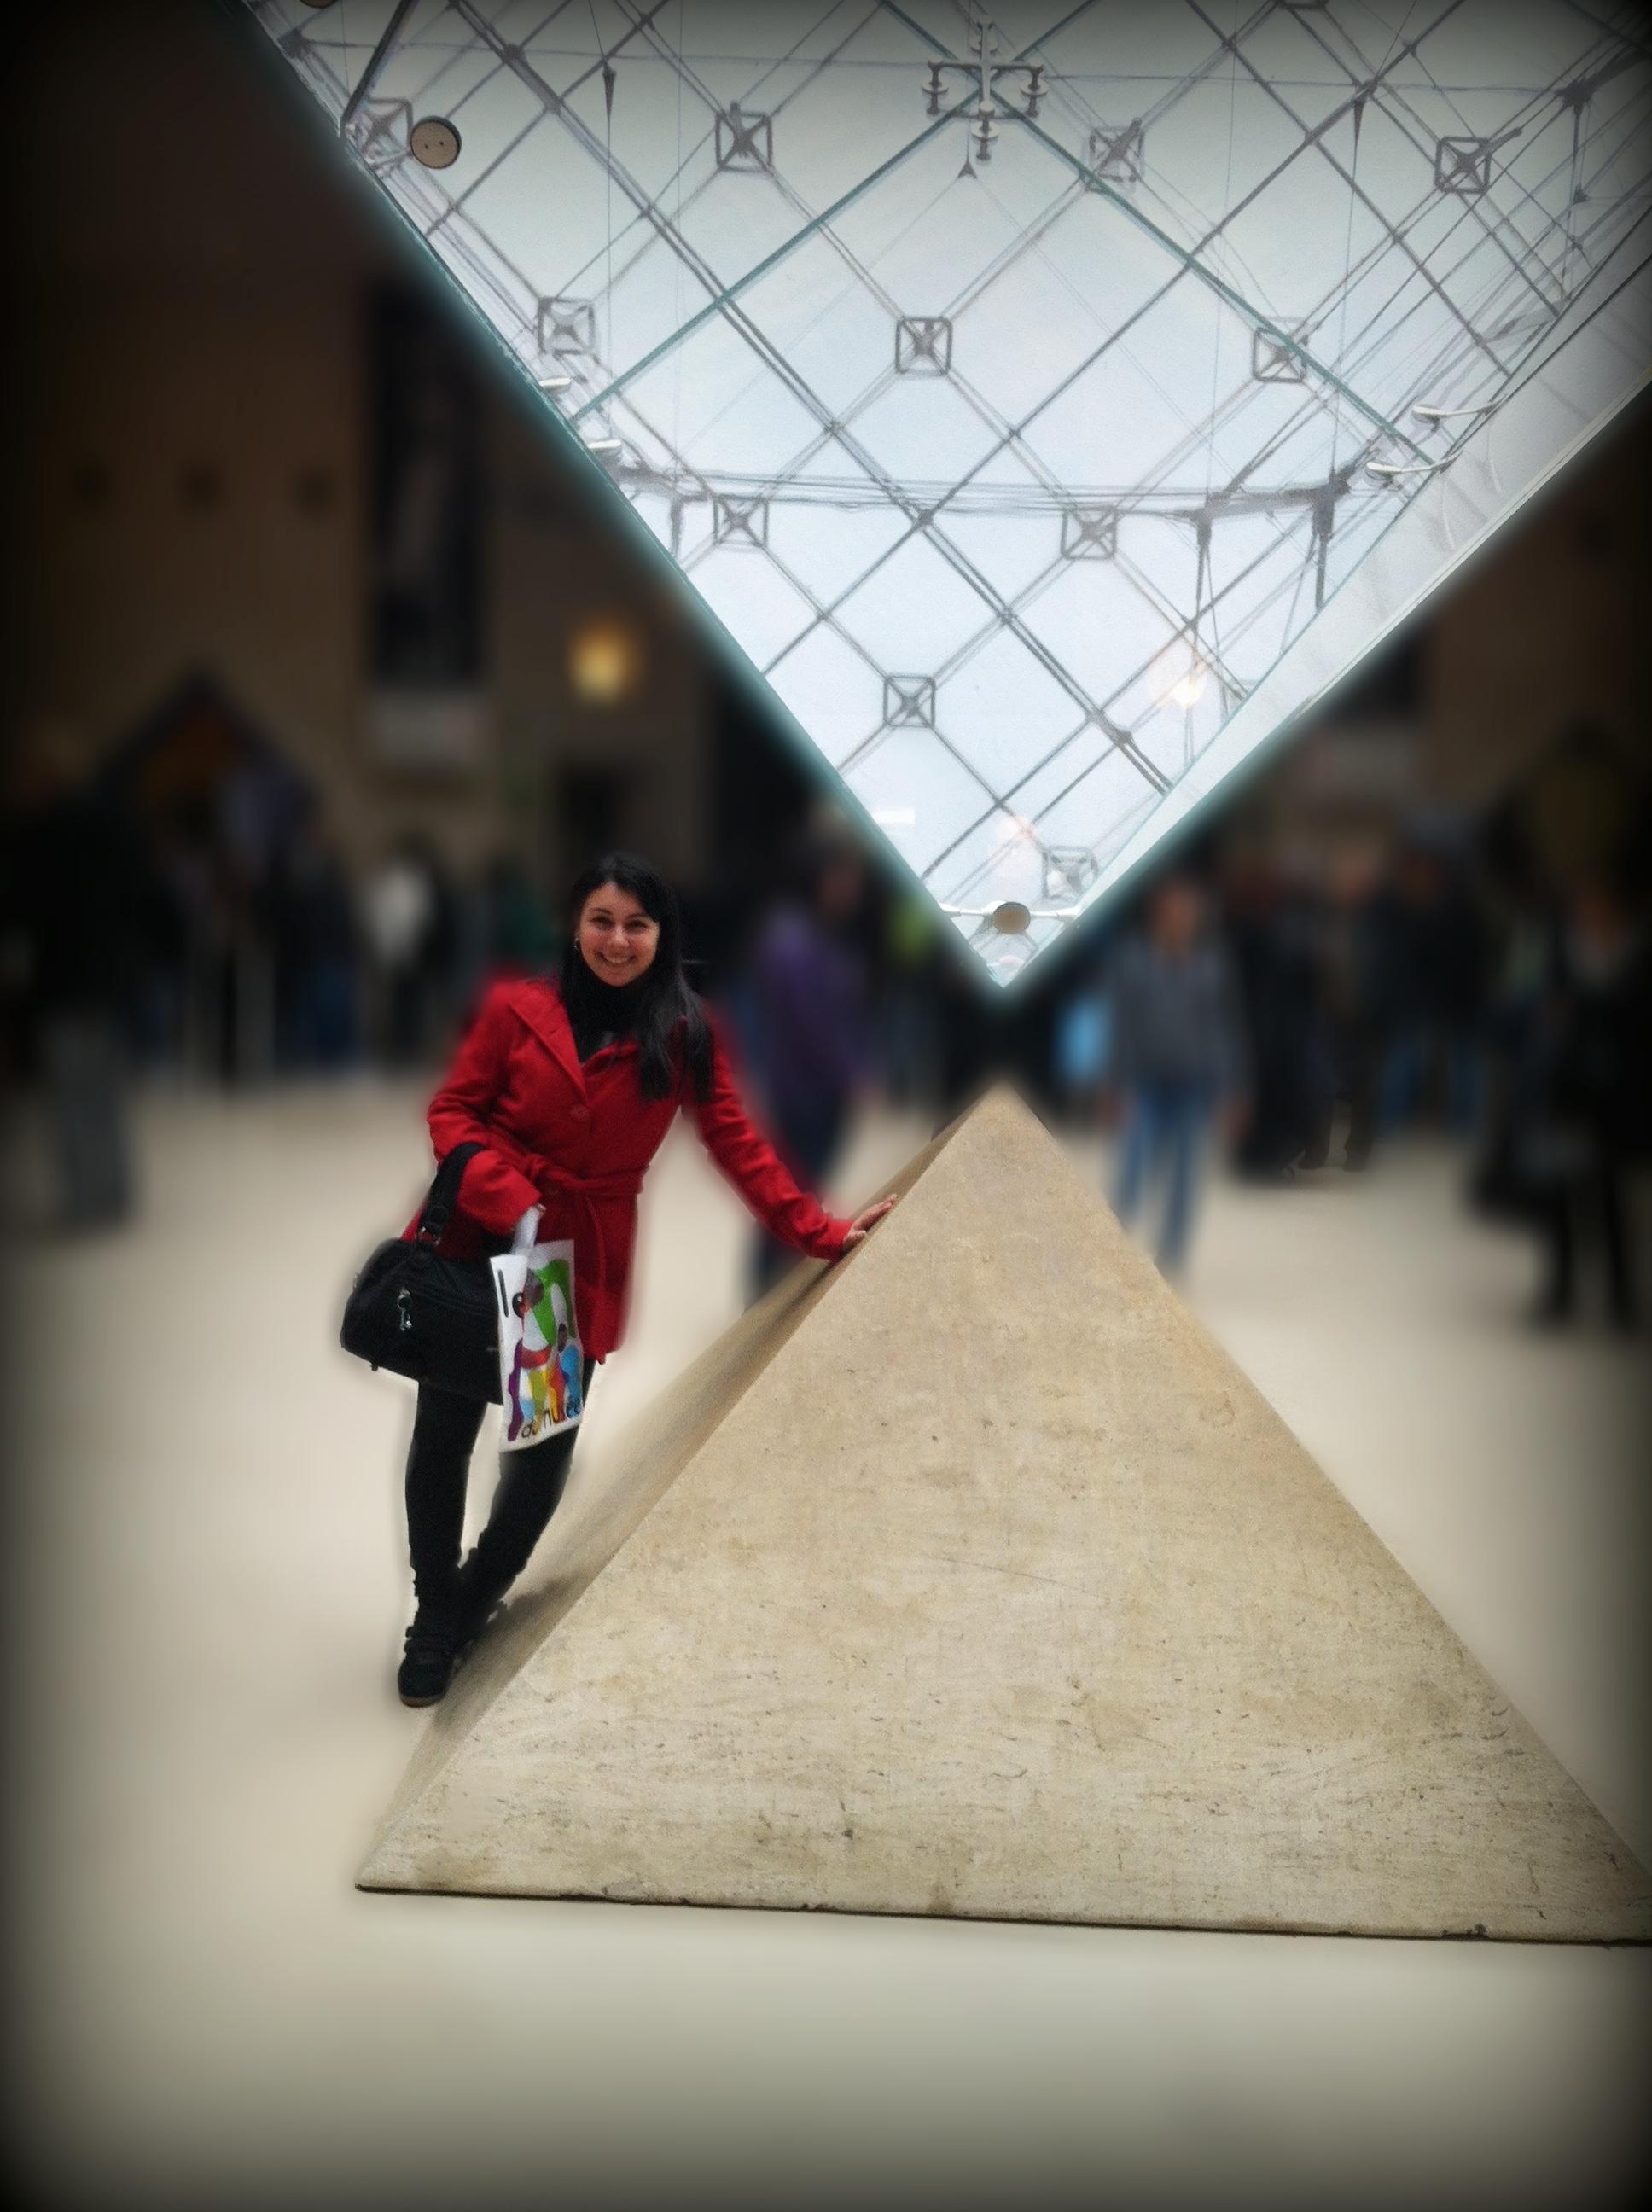 Ieoh Ming Pei: La Pyramide Inversée, 1989. Museu do Louvre.